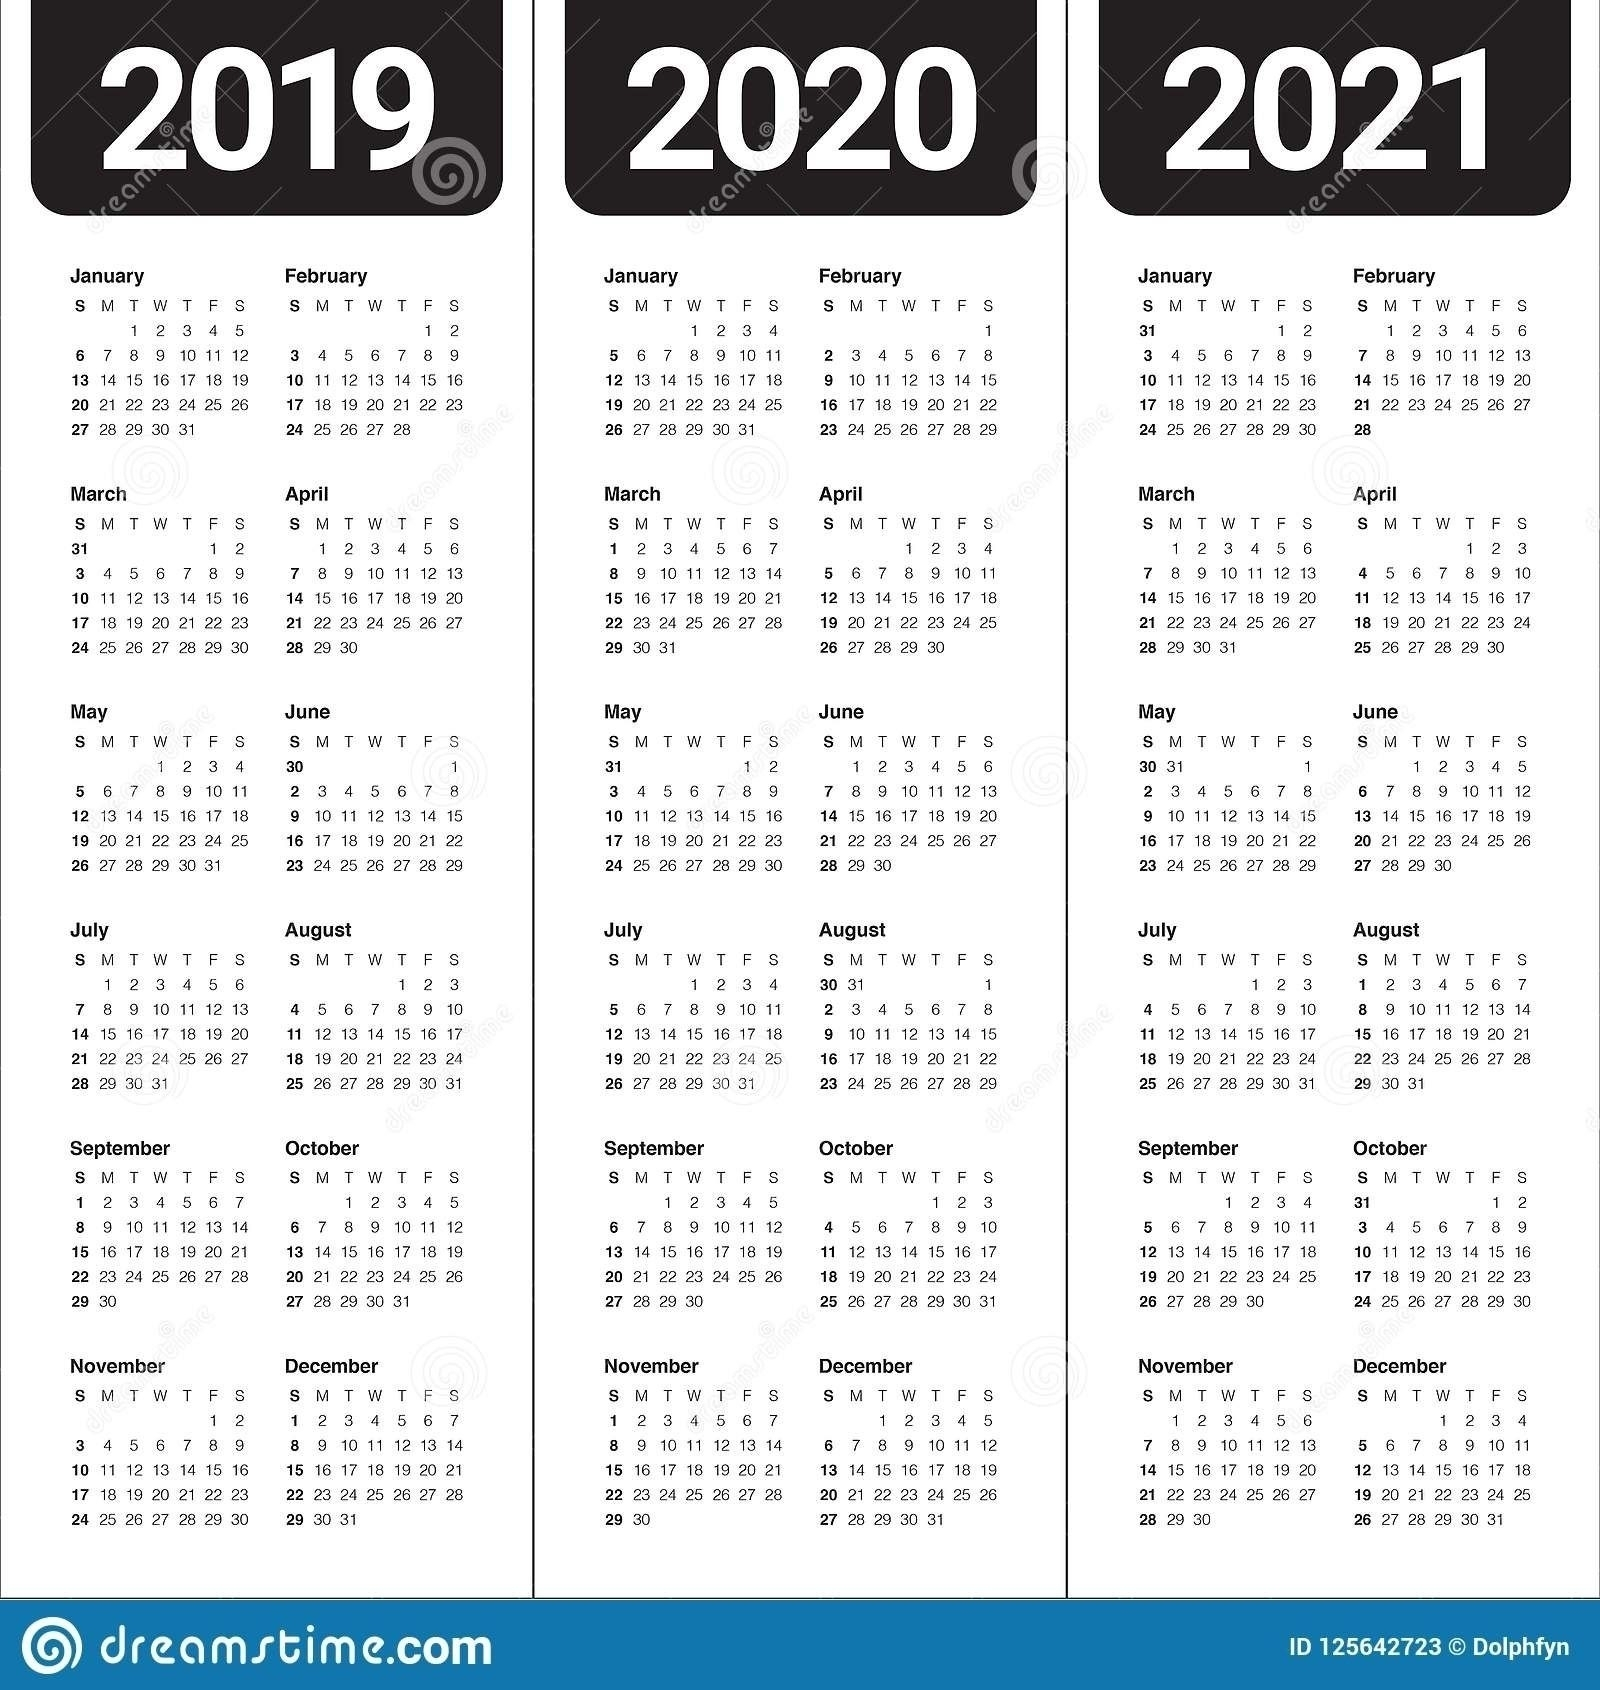 """Depo Provera"" And ""Printable Calendar"" And 2021 - Template Calendar Design"